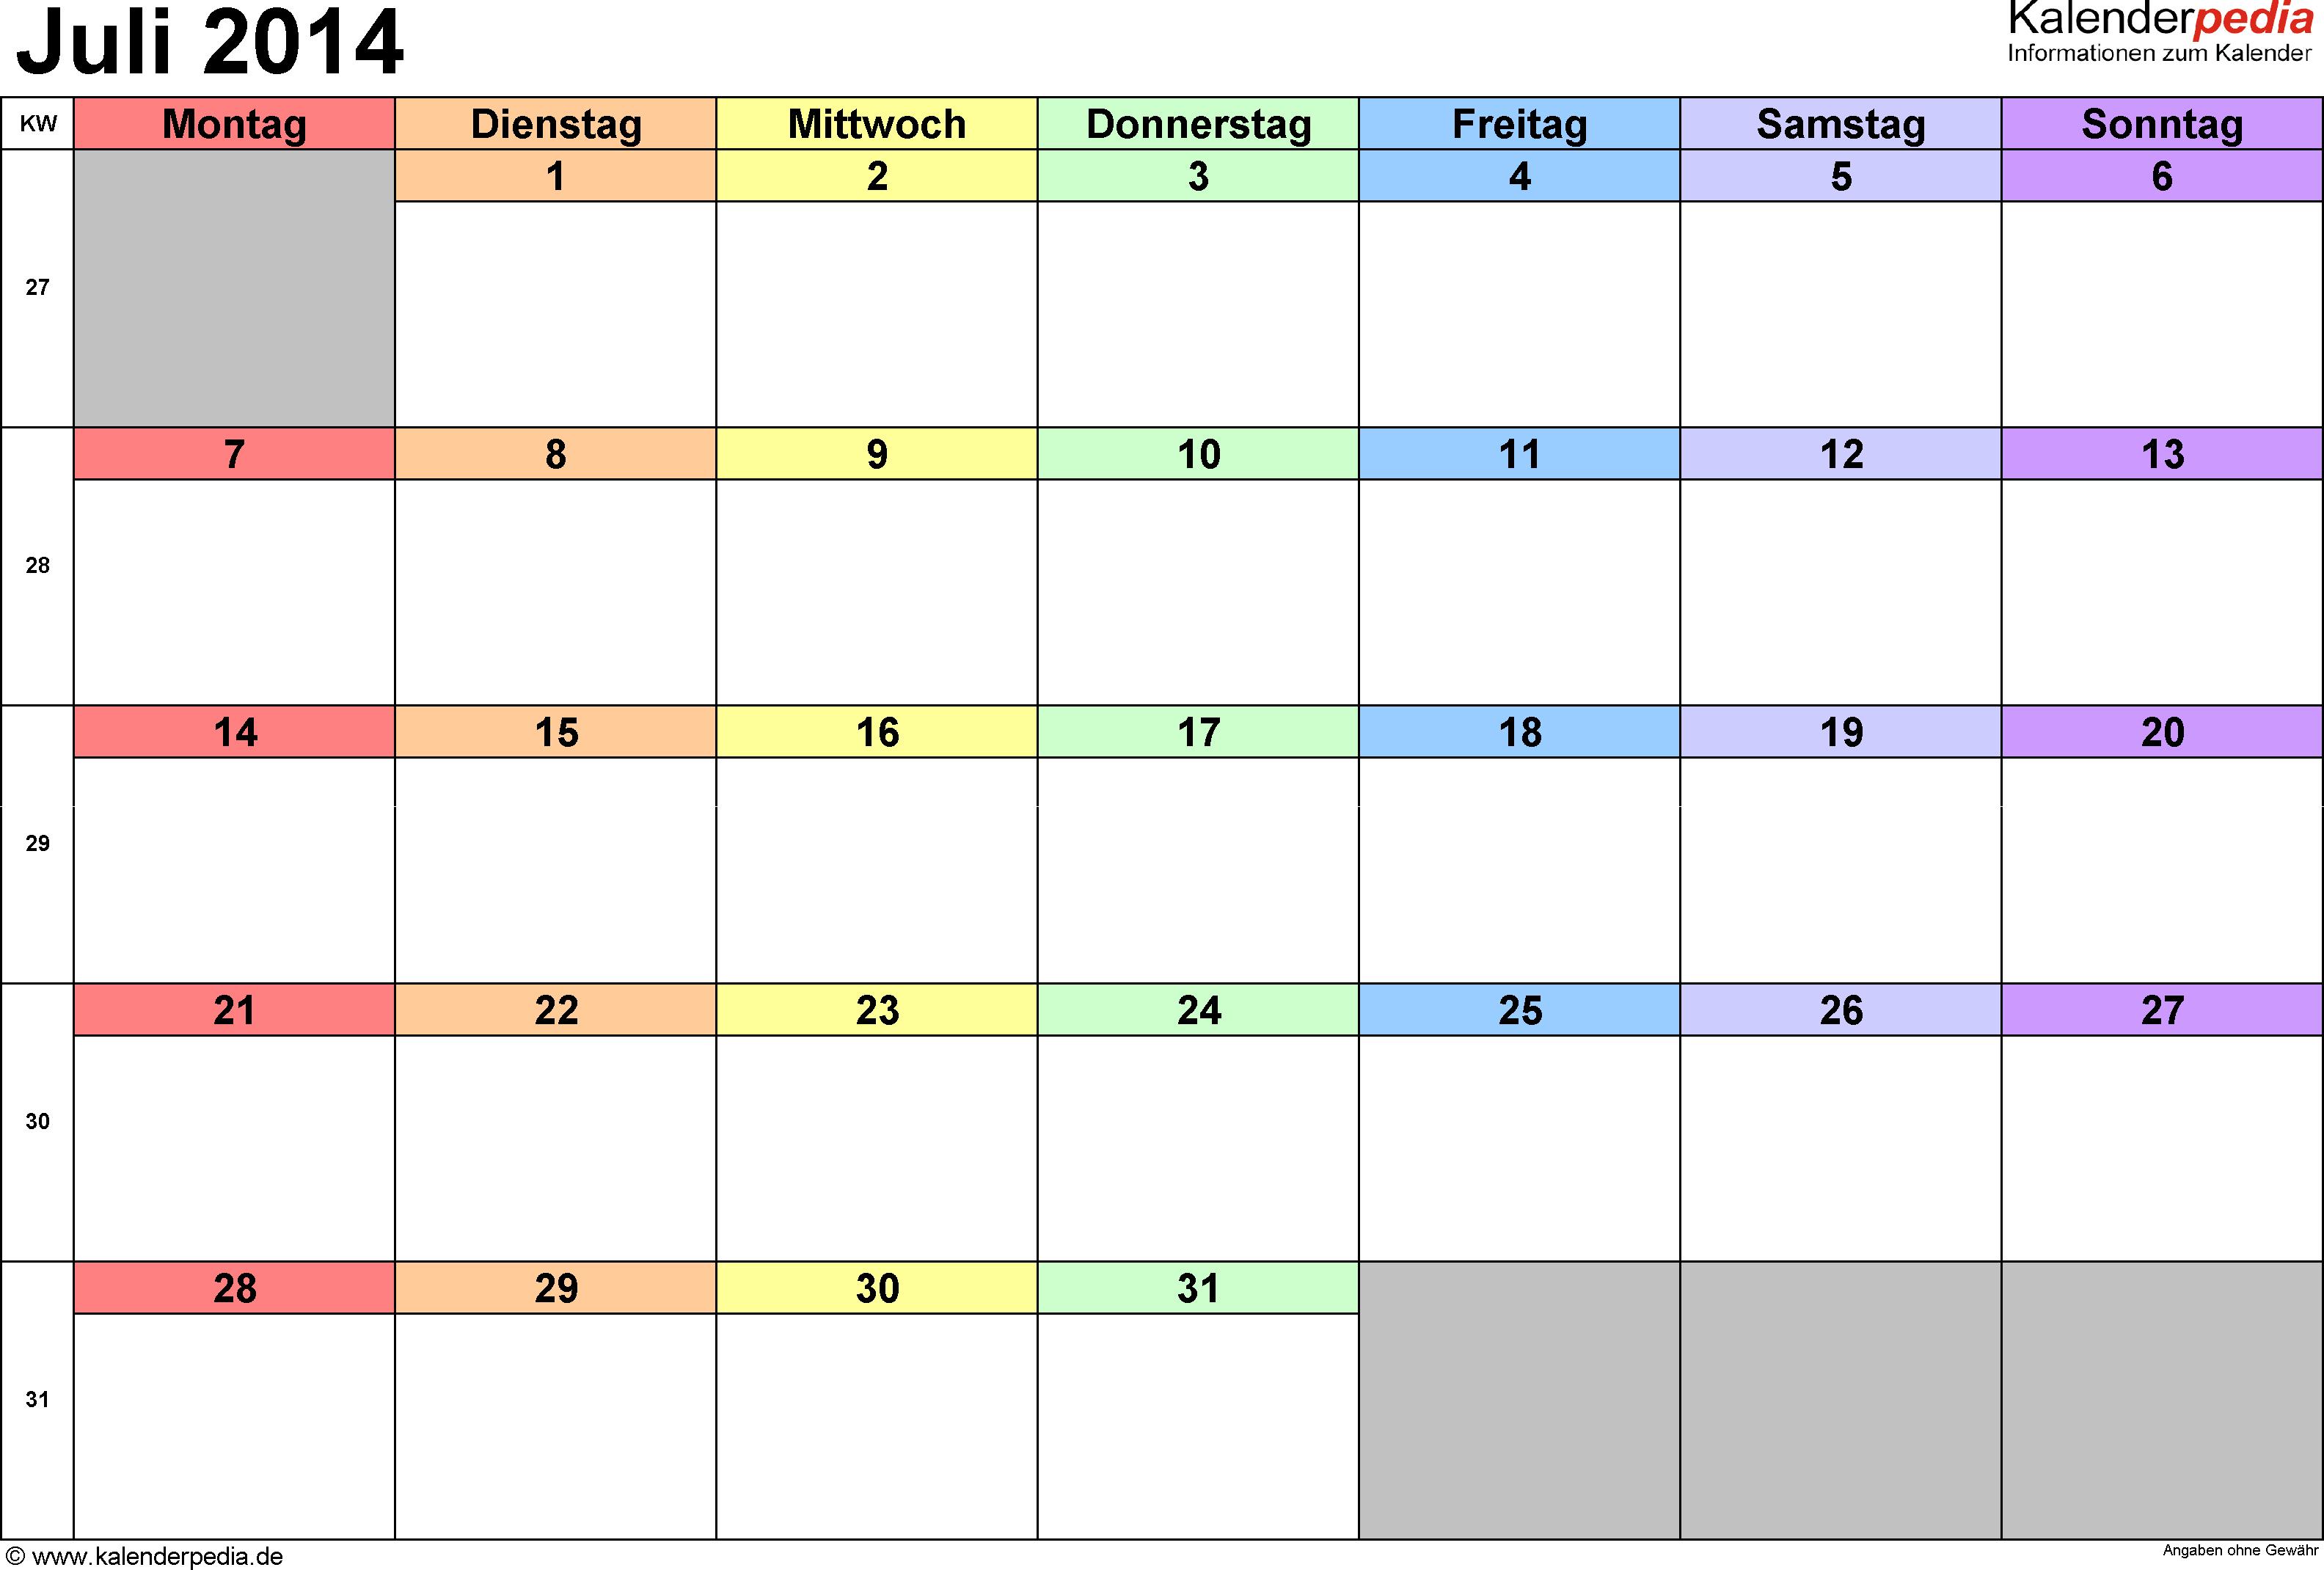 Kalender Juli 2014 (Querformat) als Excel-Vorlage